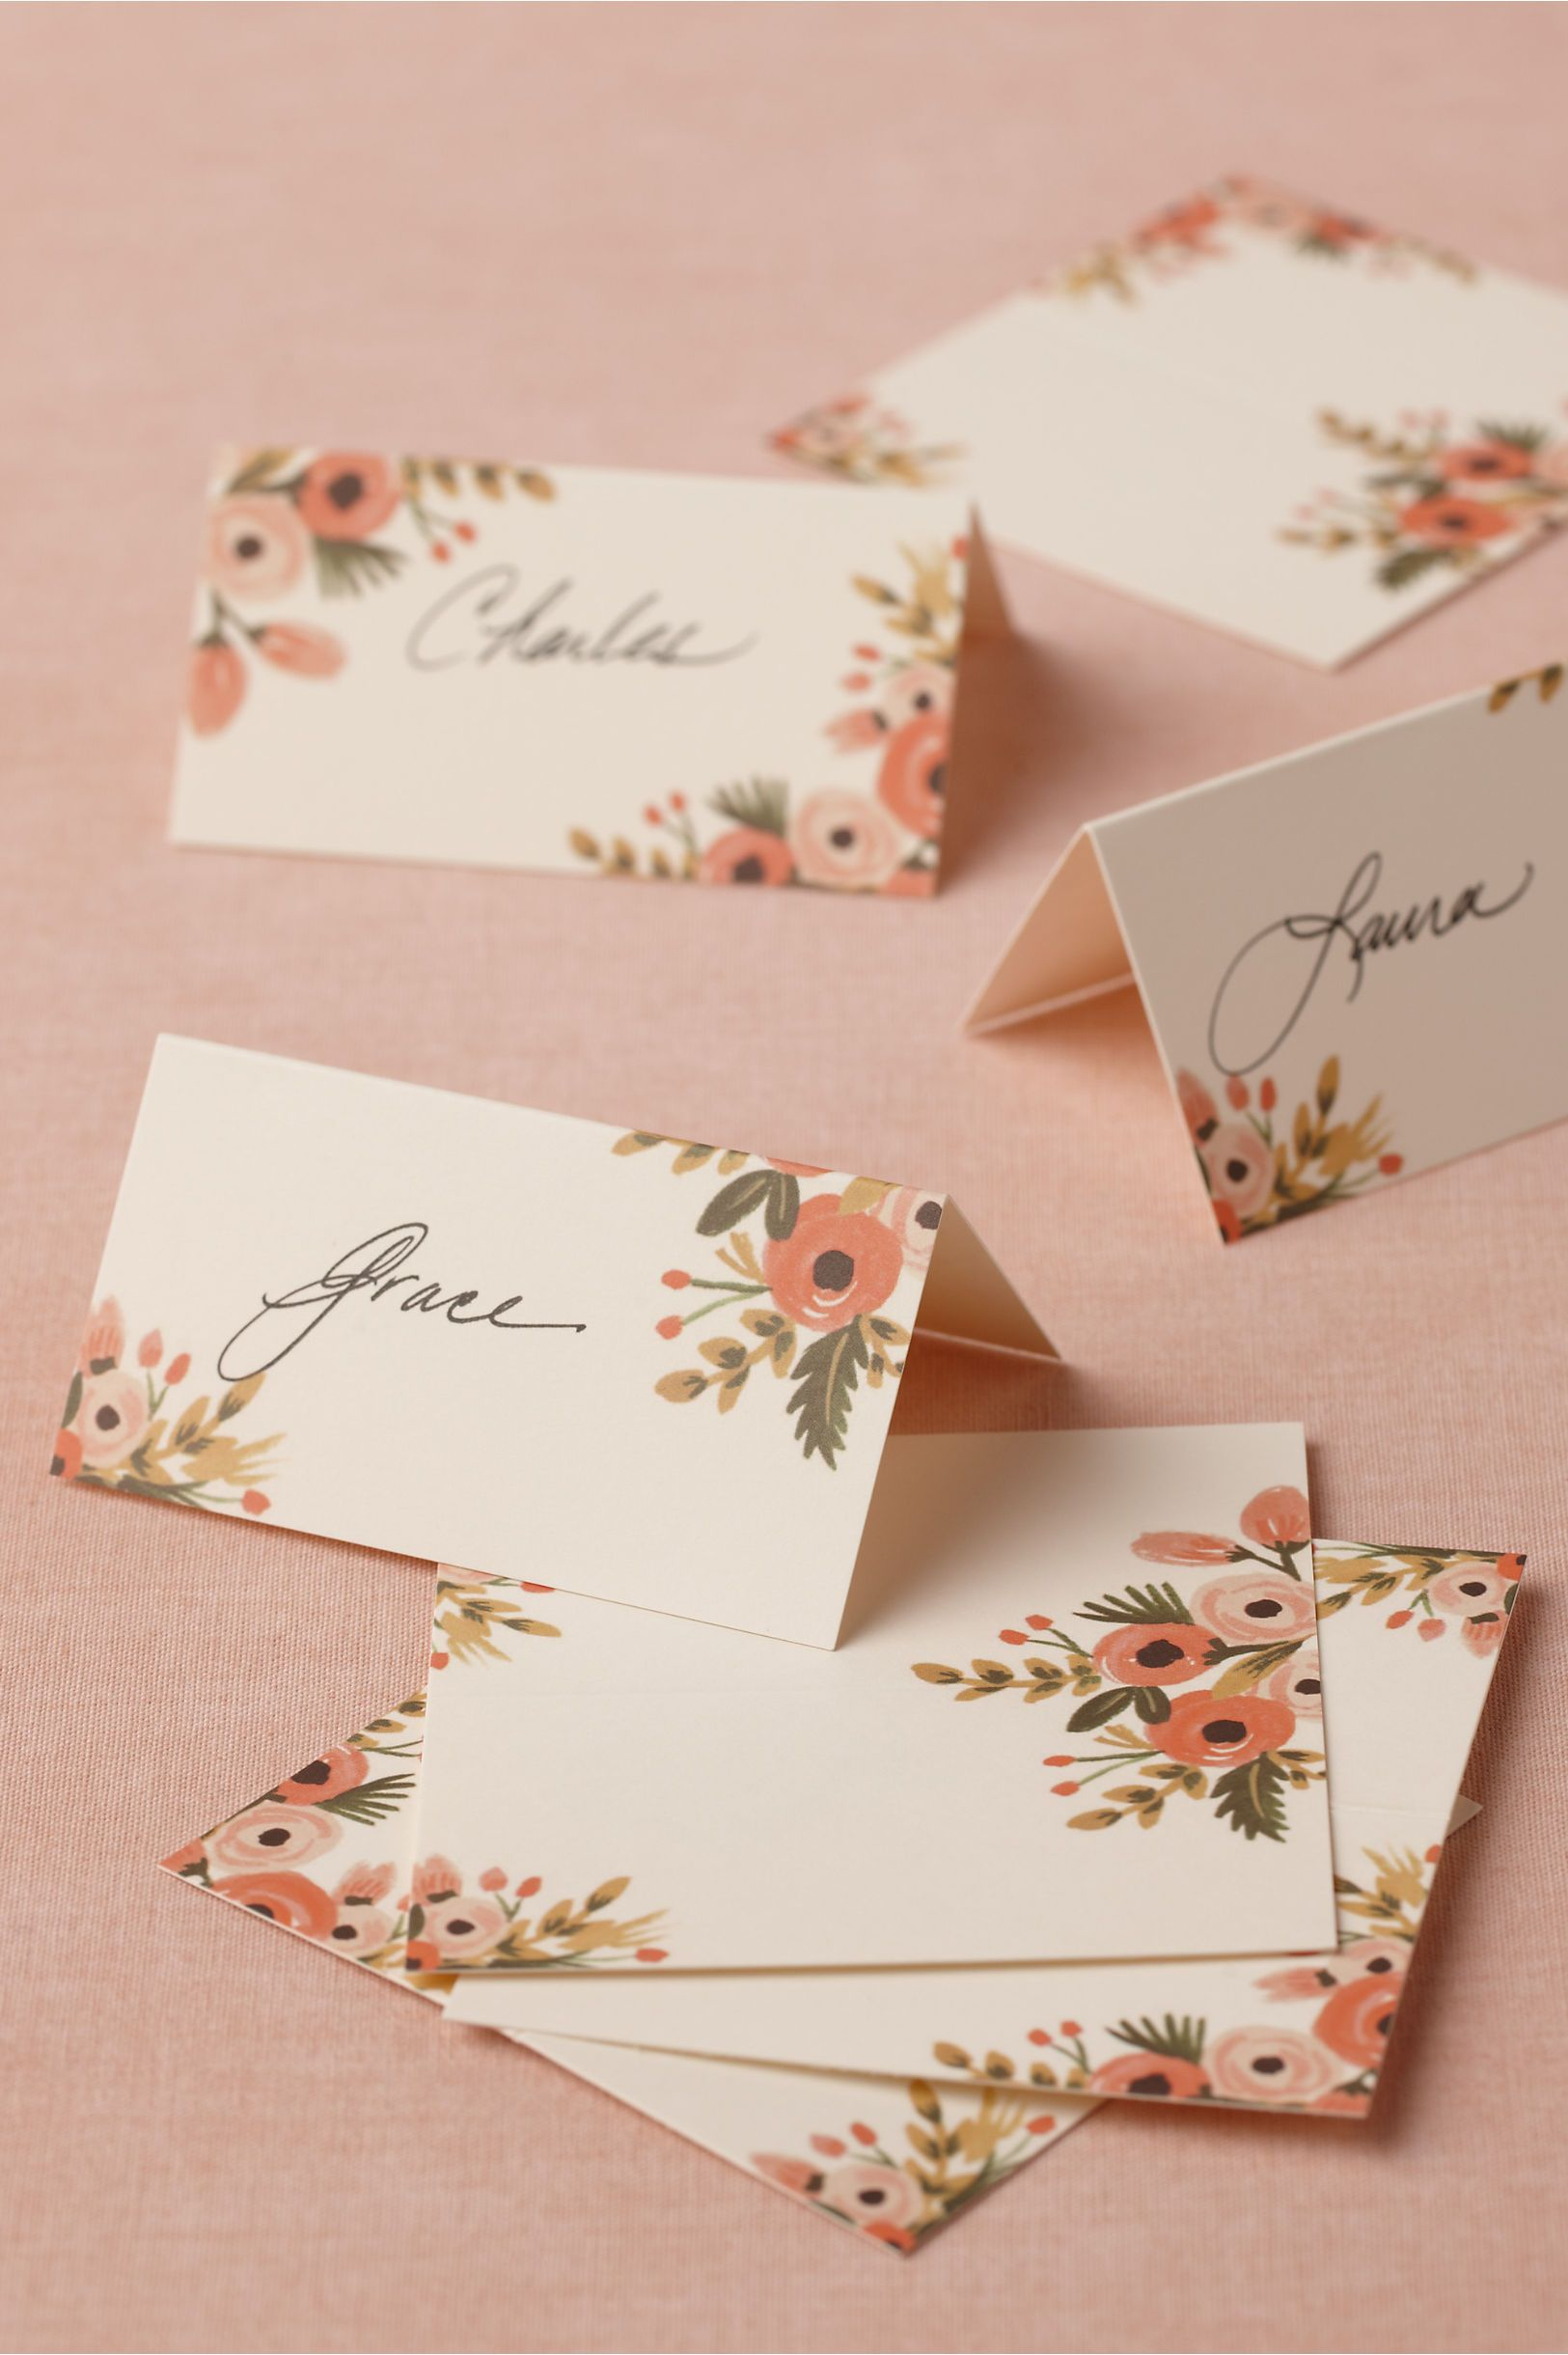 Decorations For A Backyard Wedding - Rustic Wedding Chic